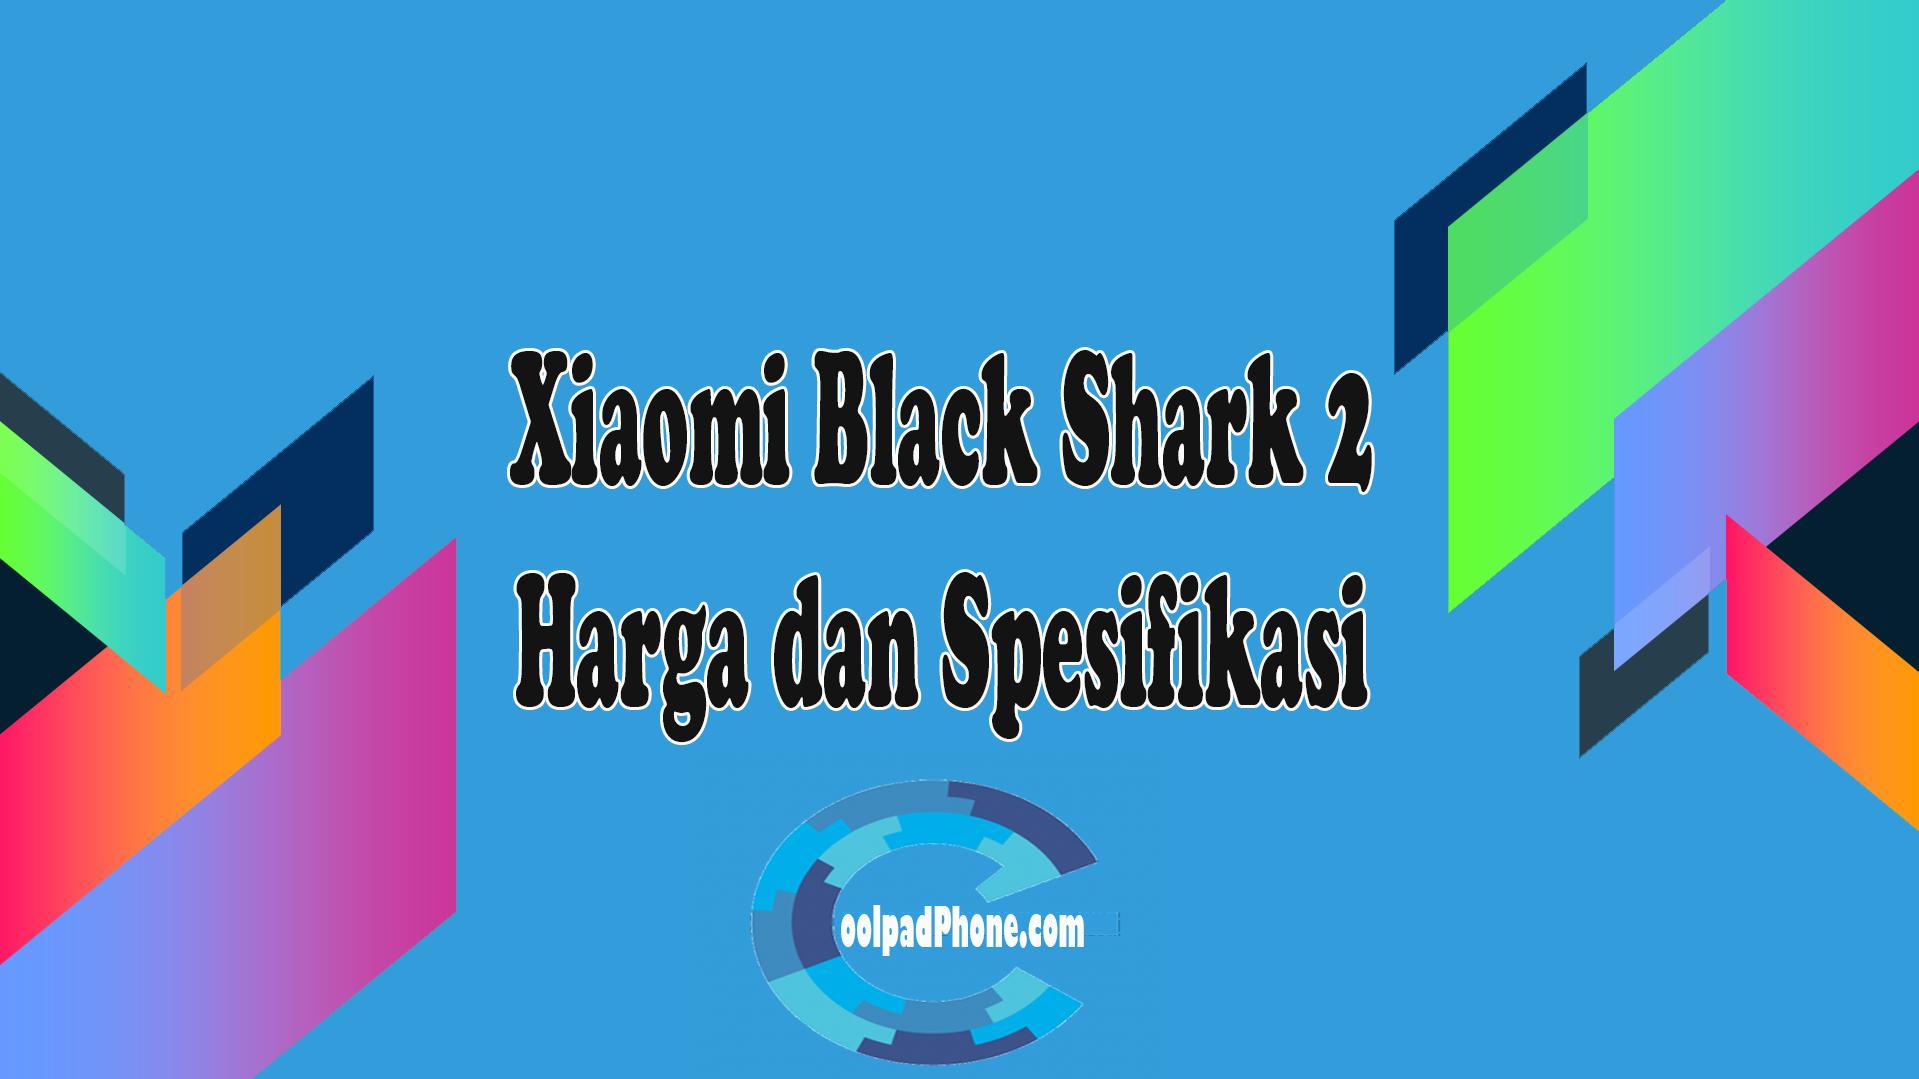 Xiaomi Black Shark 2 Harga dan Spesifikasi